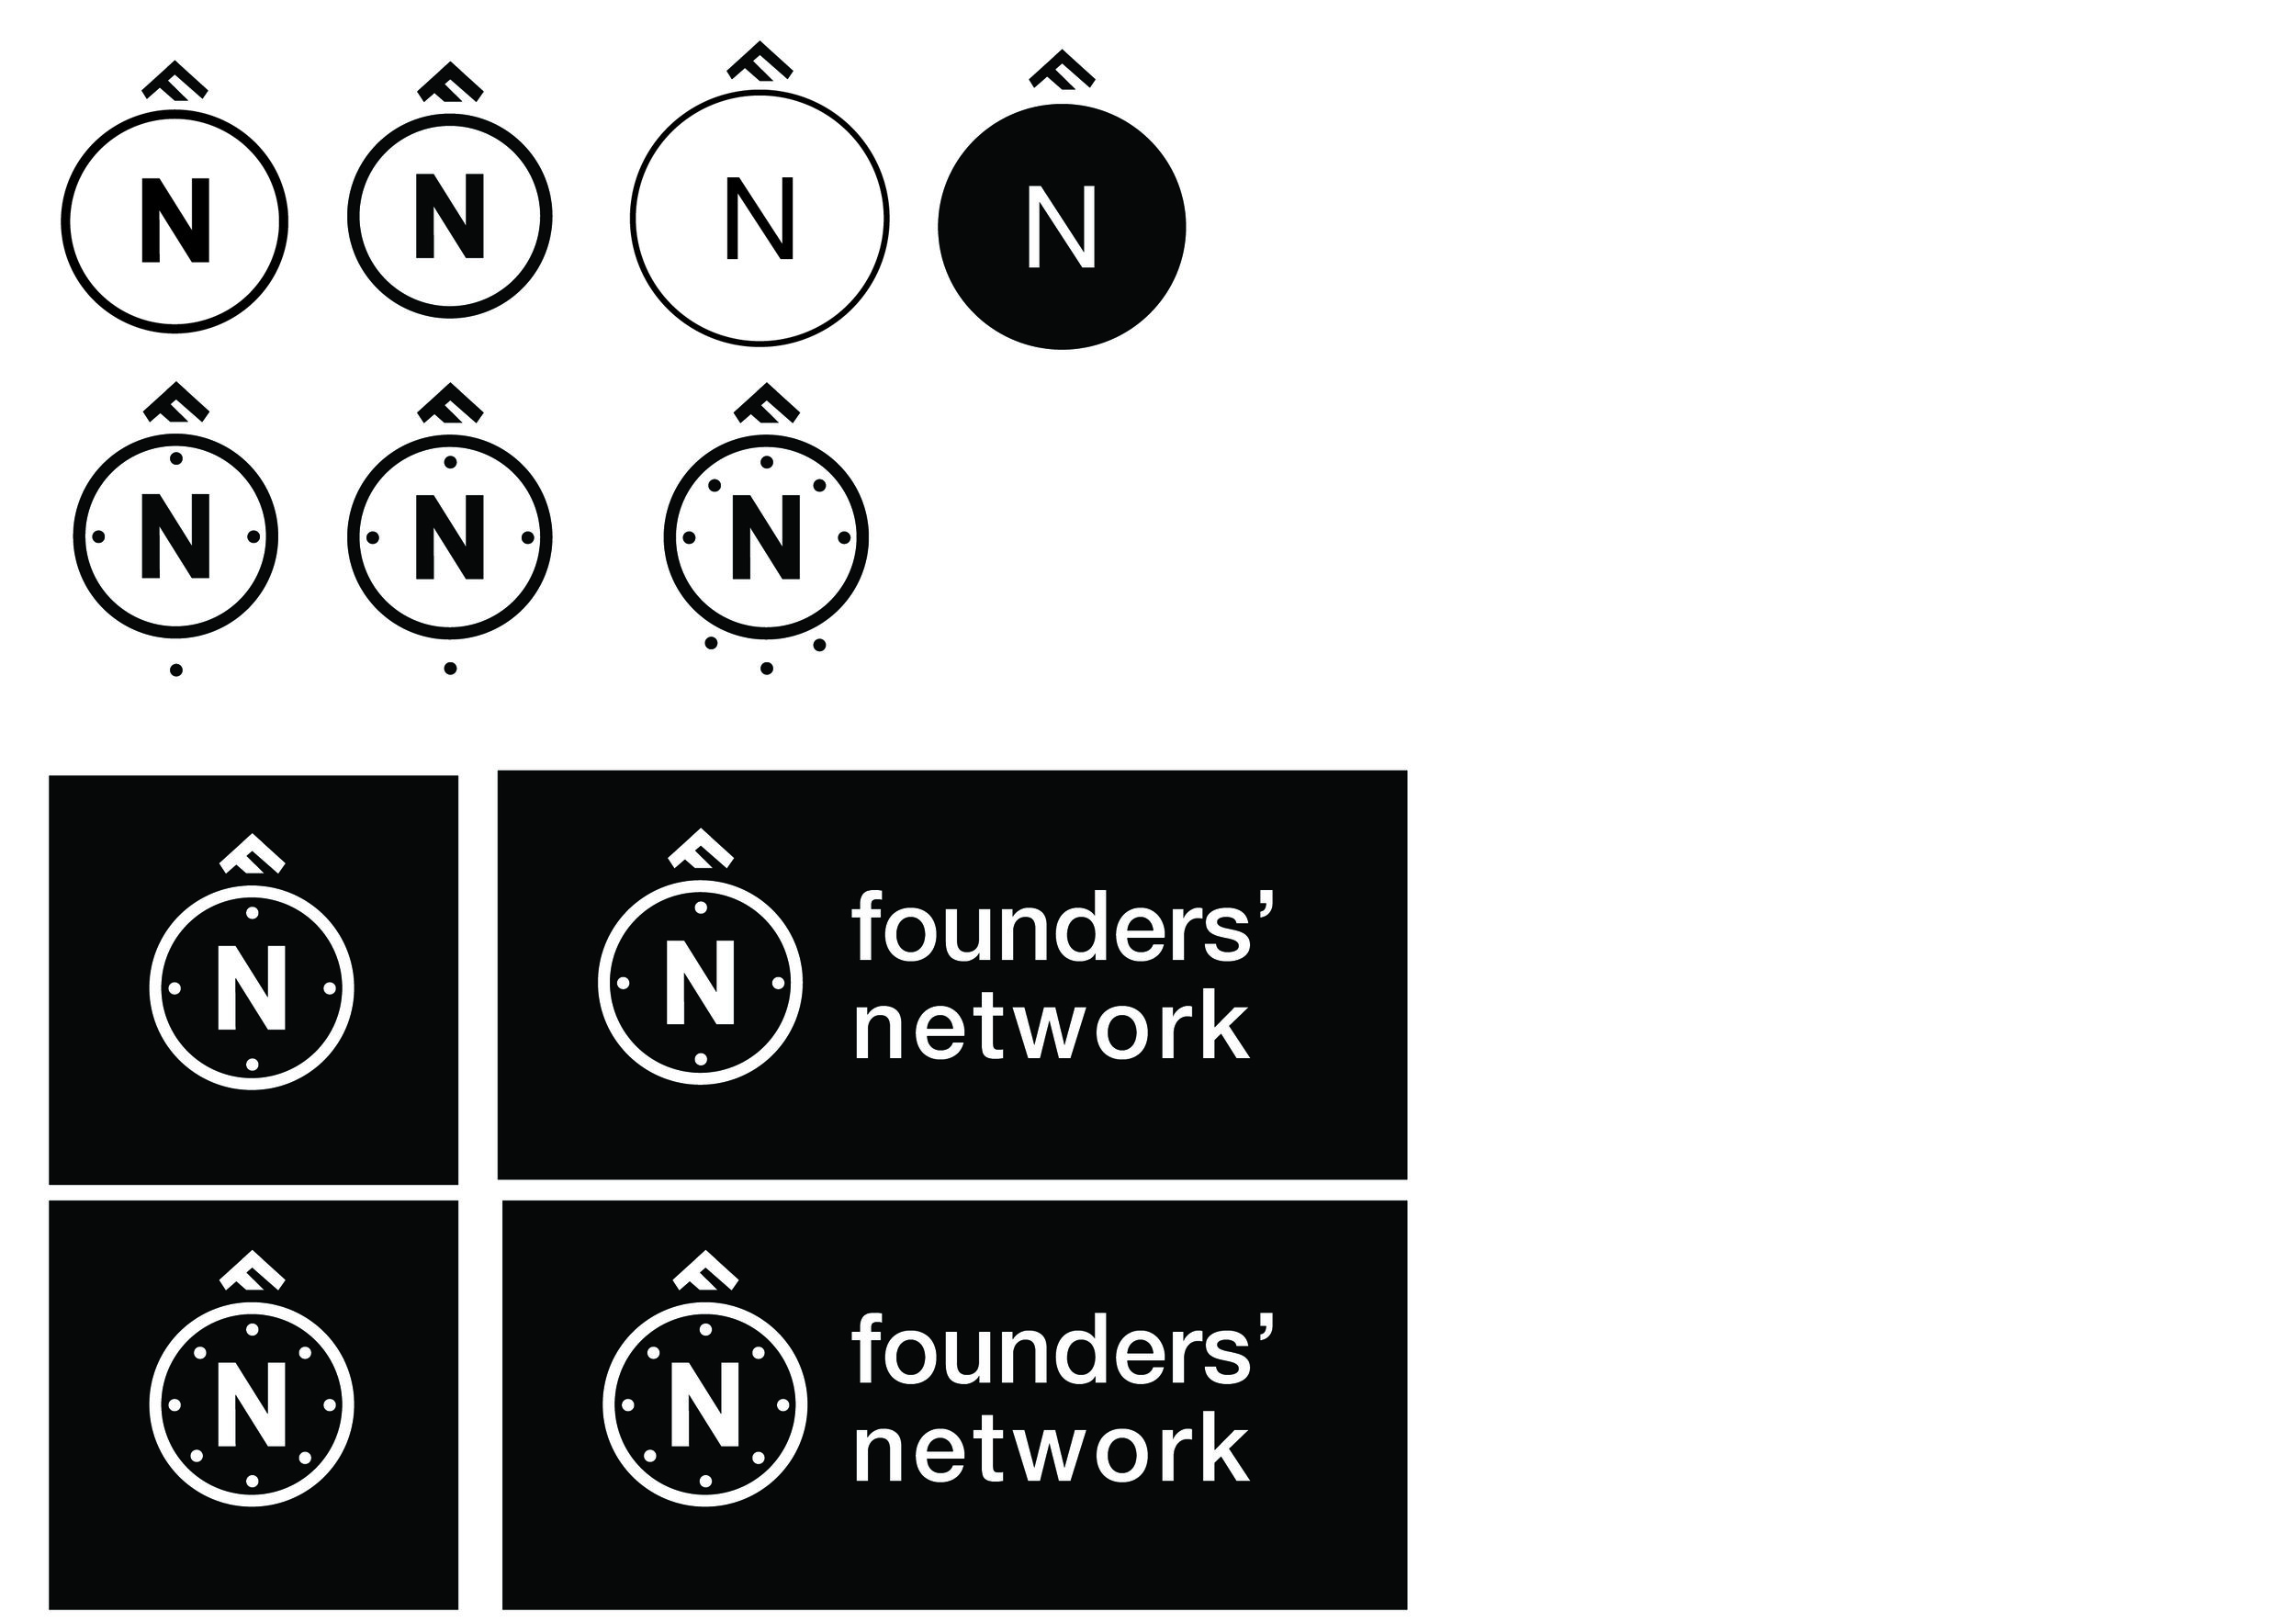 TechNorth-Founders-Network2-04.jpg